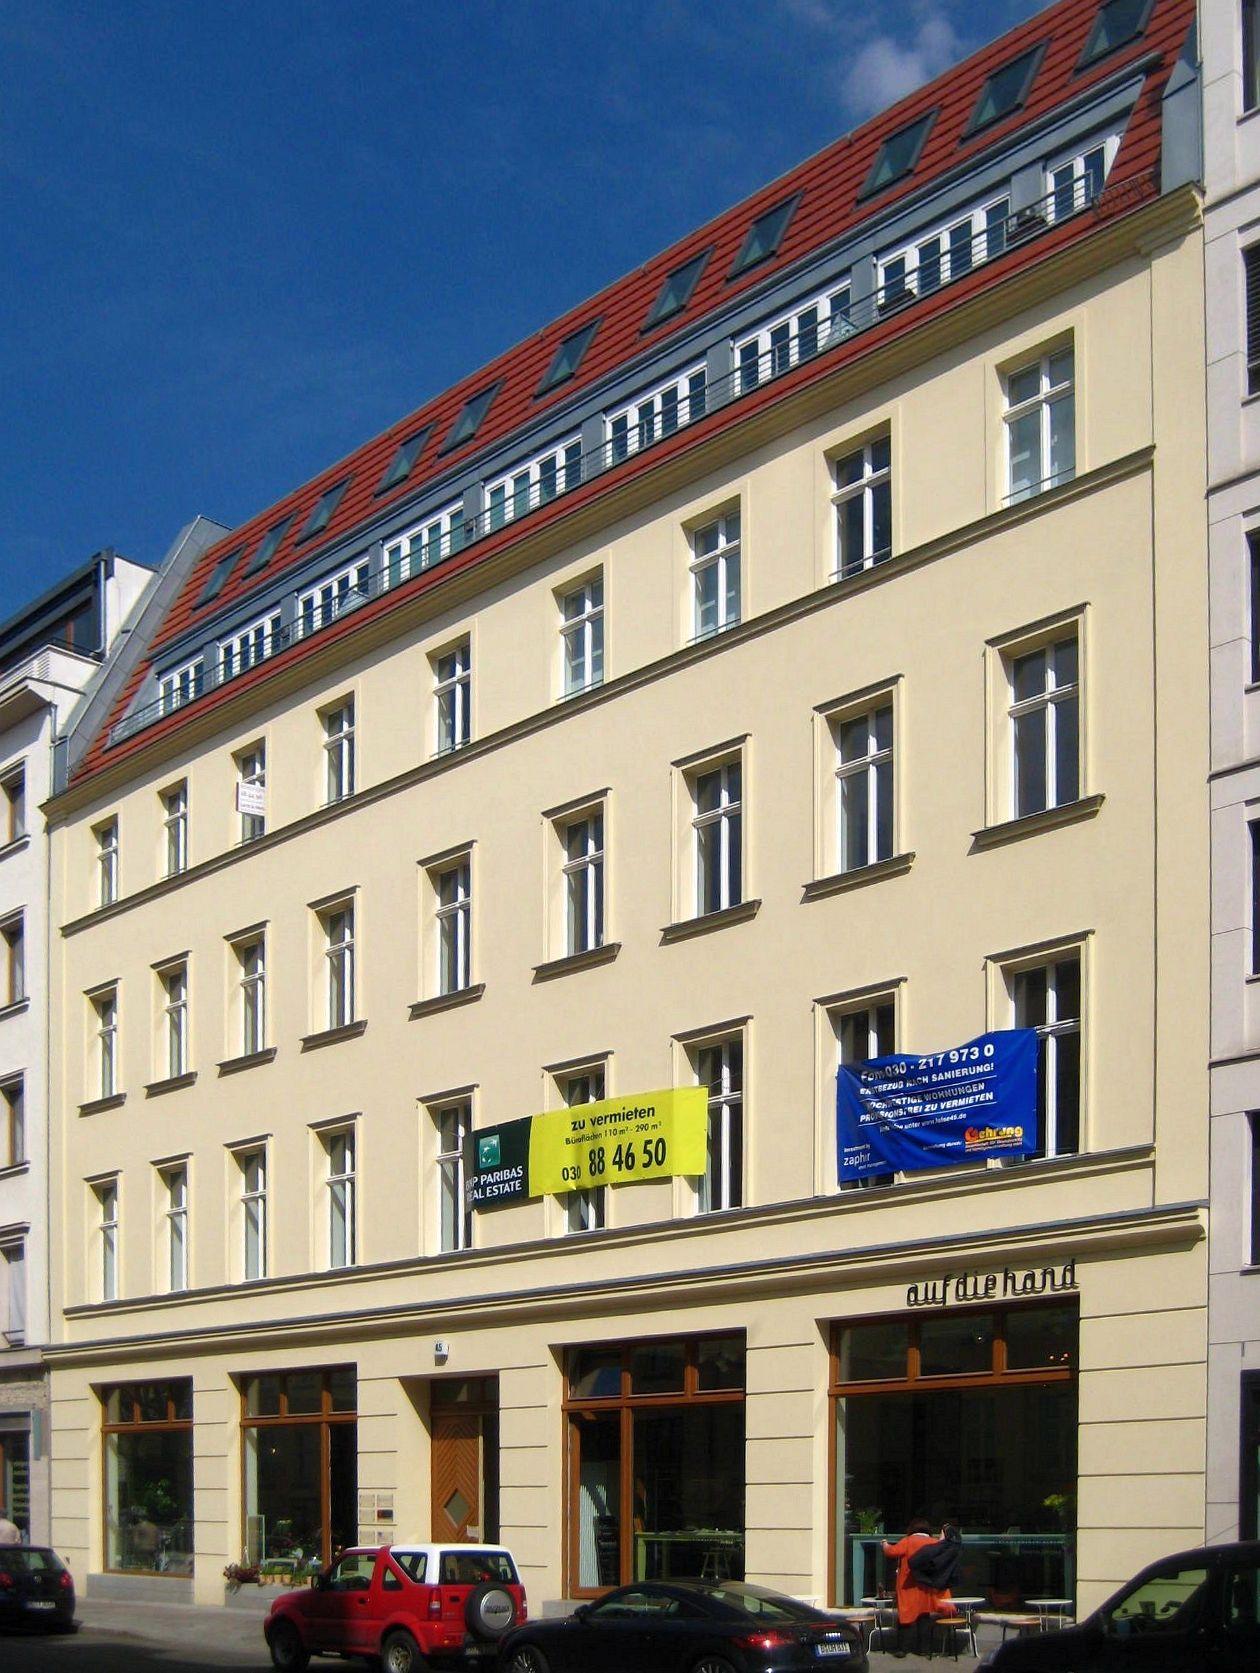 Luisenstraße Berlin